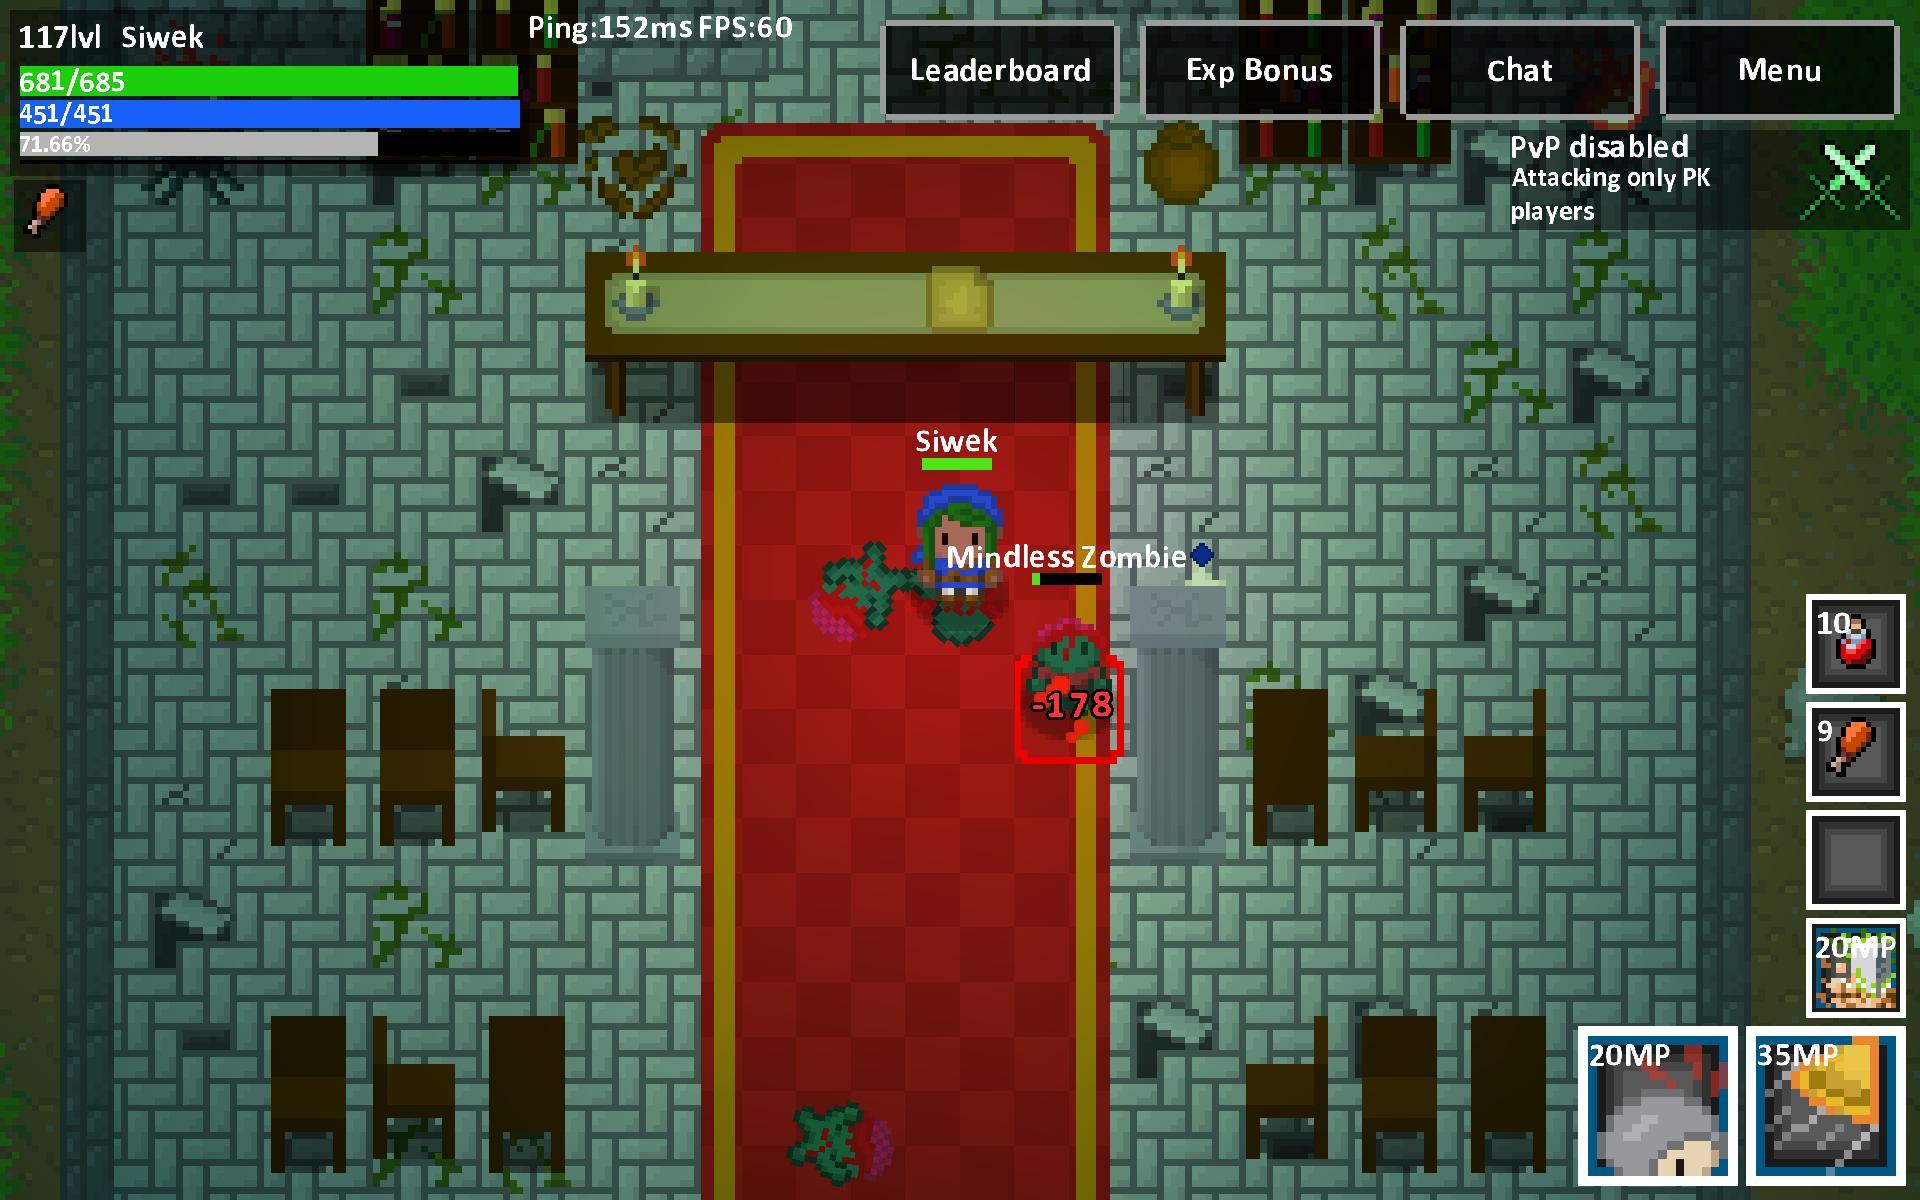 Heroes & Rats MMORPG Online 0.32.2 Screenshot 3